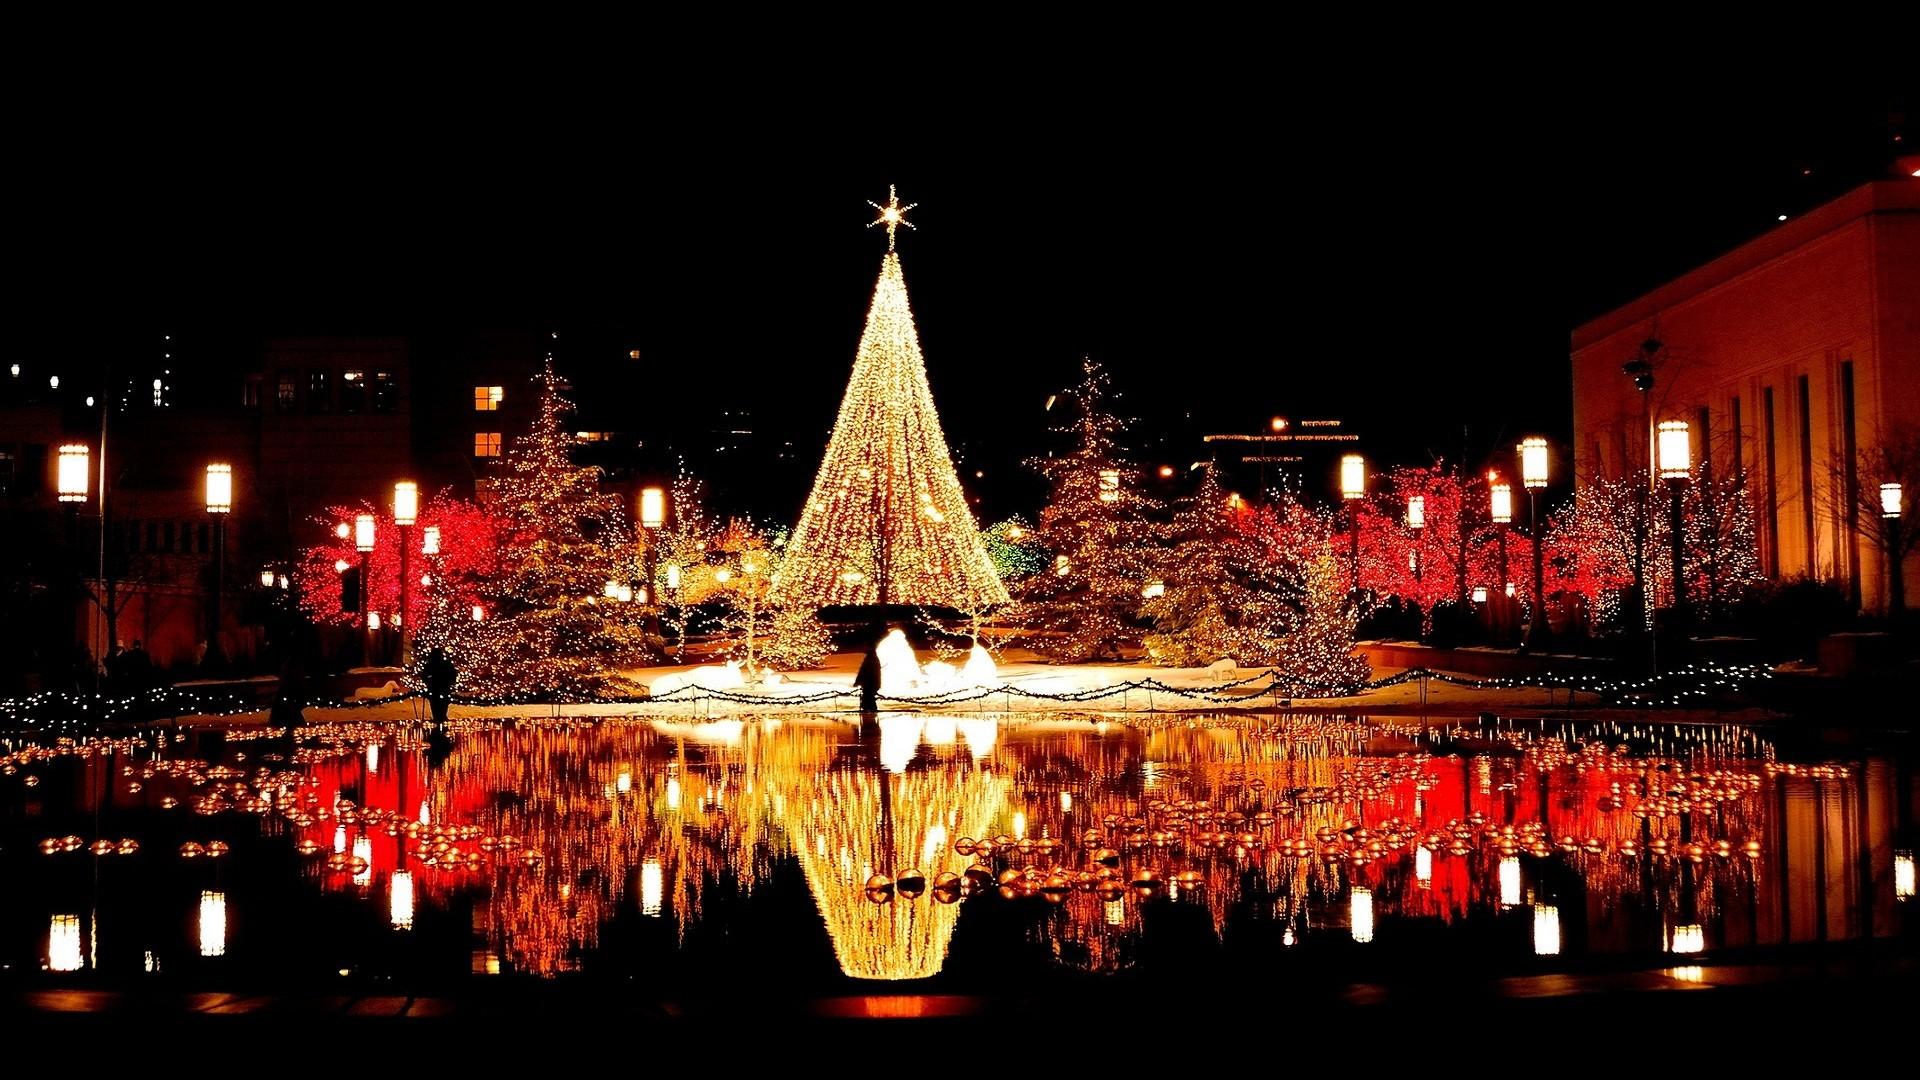 Christmas reflection light 1080p hd photos.